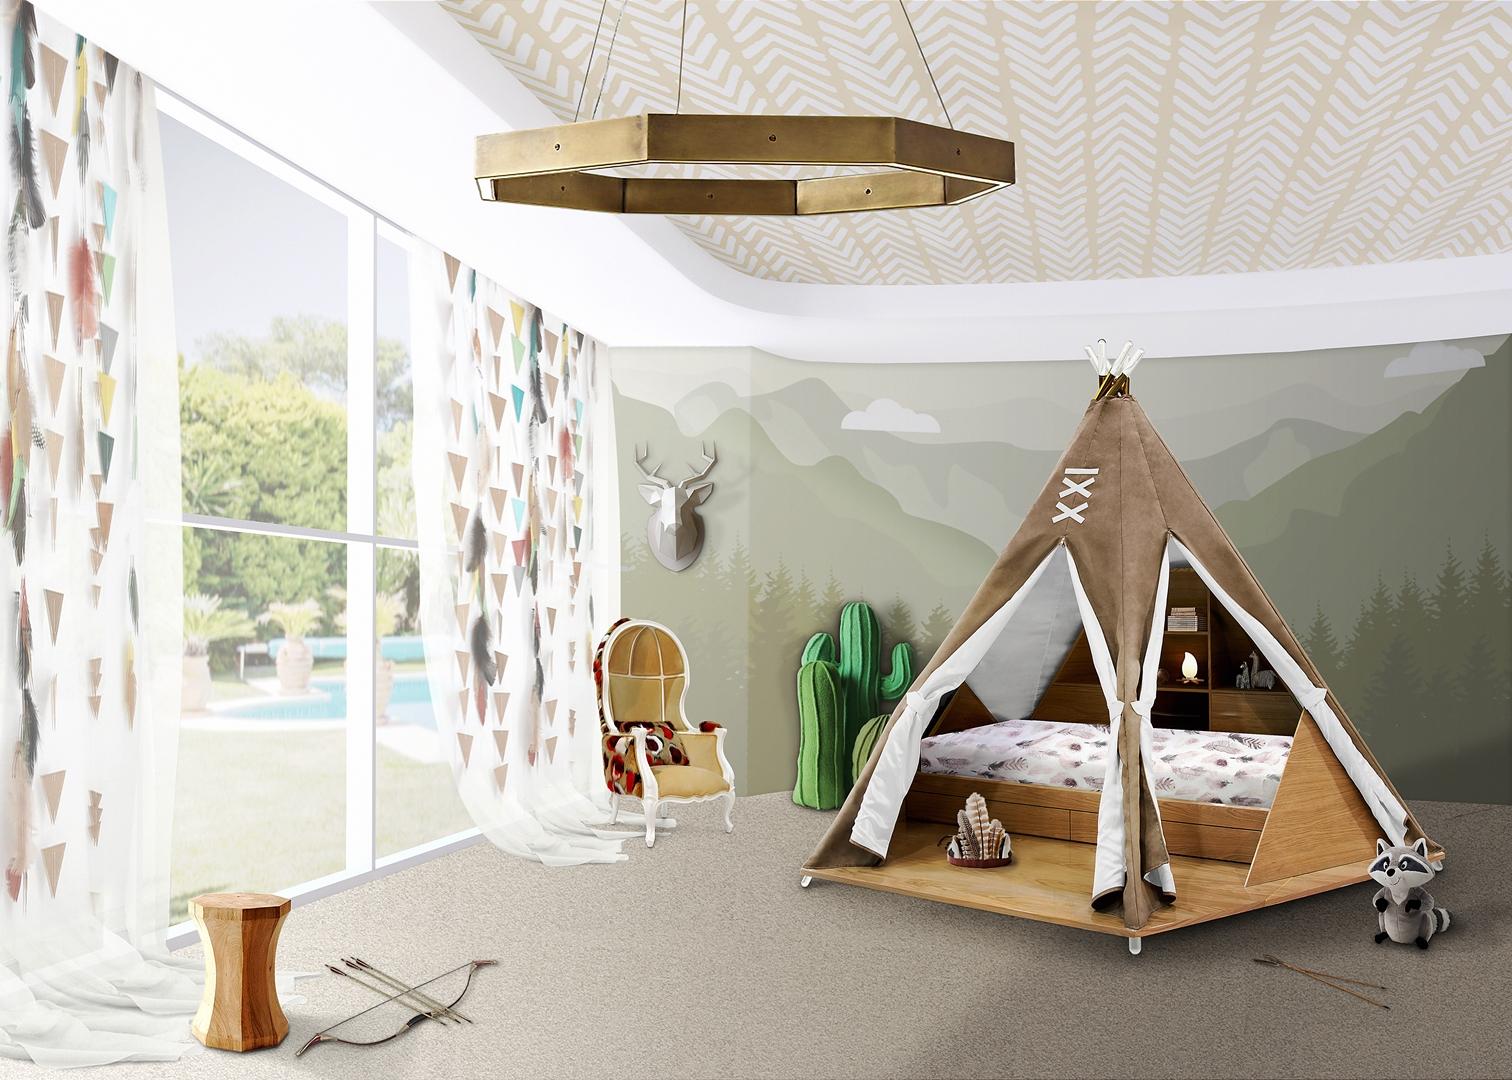 teepee-room-ambience-circu-magical-furniture-01 (1) (Copy)